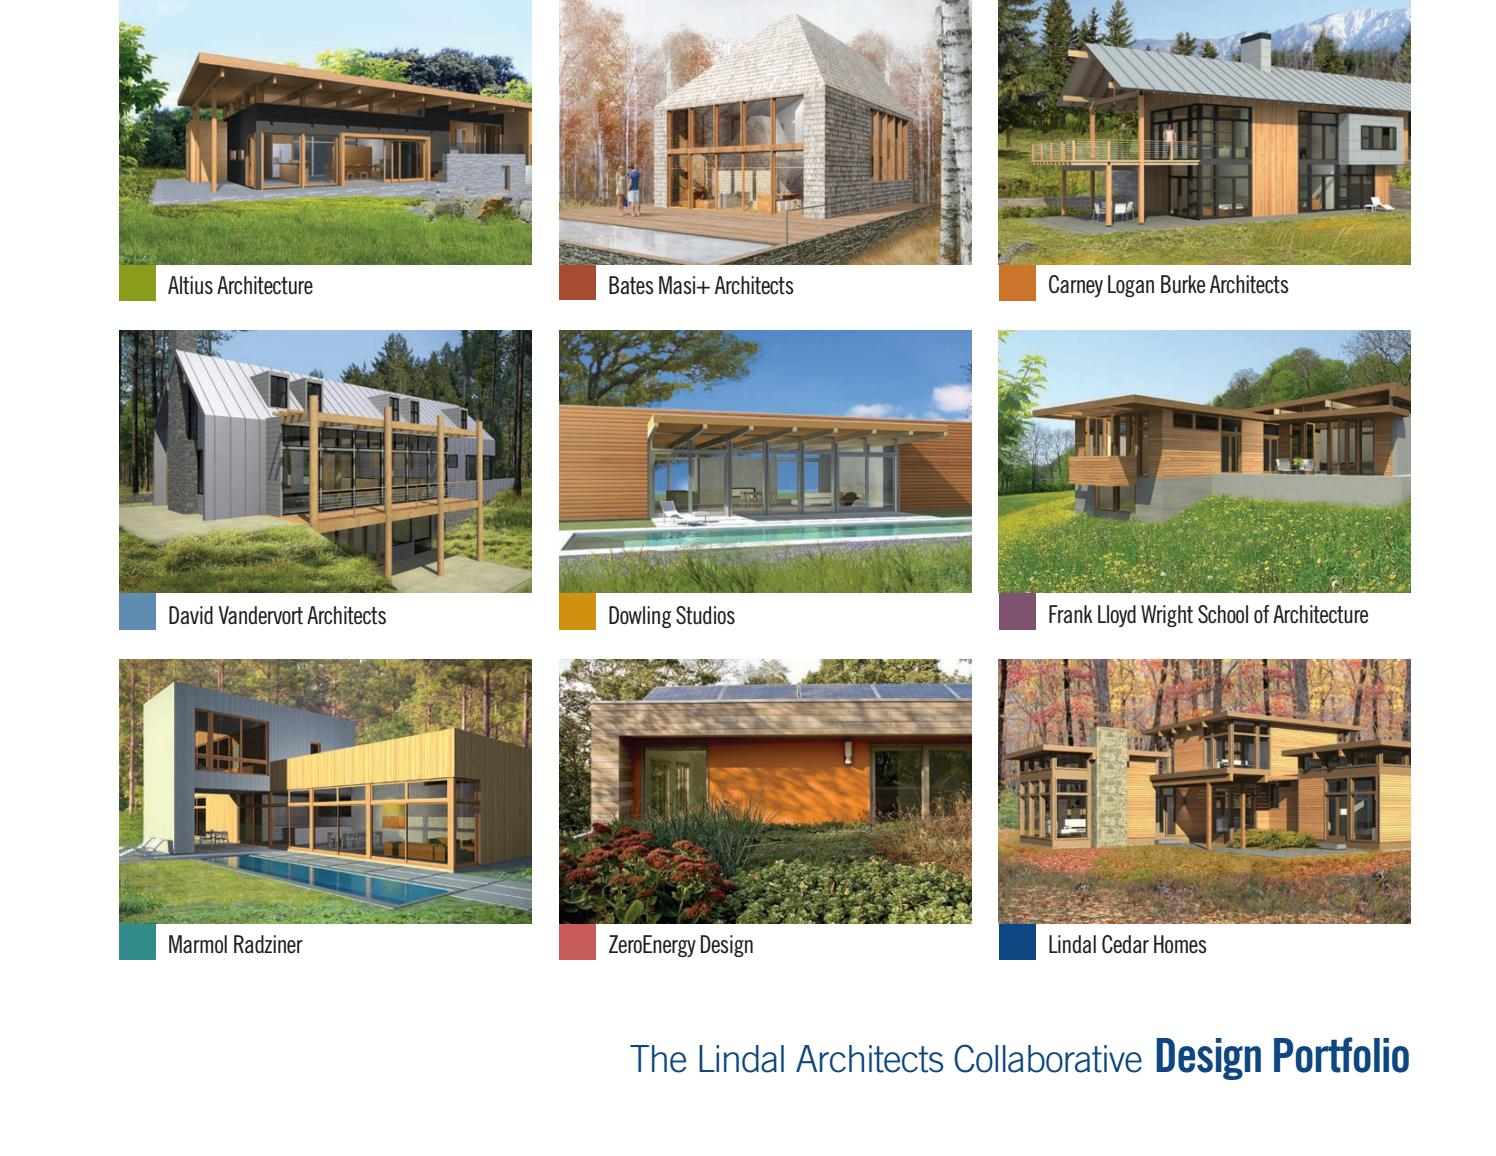 Architect designed homes for lindal cedar homes by the for Lindal homes floor plans